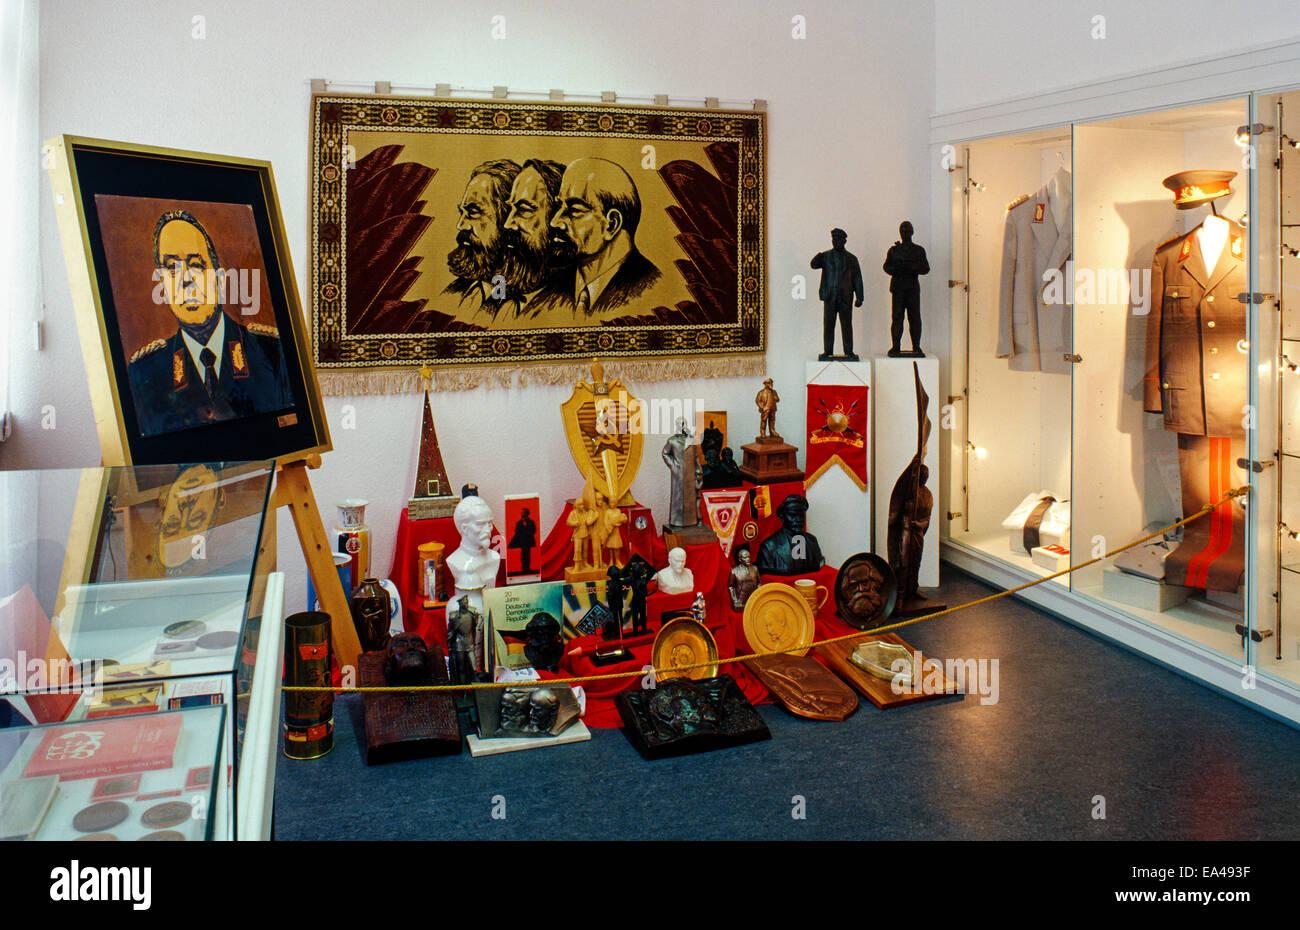 Devotional objects, Stasi Museum, Berlin - Stock Image